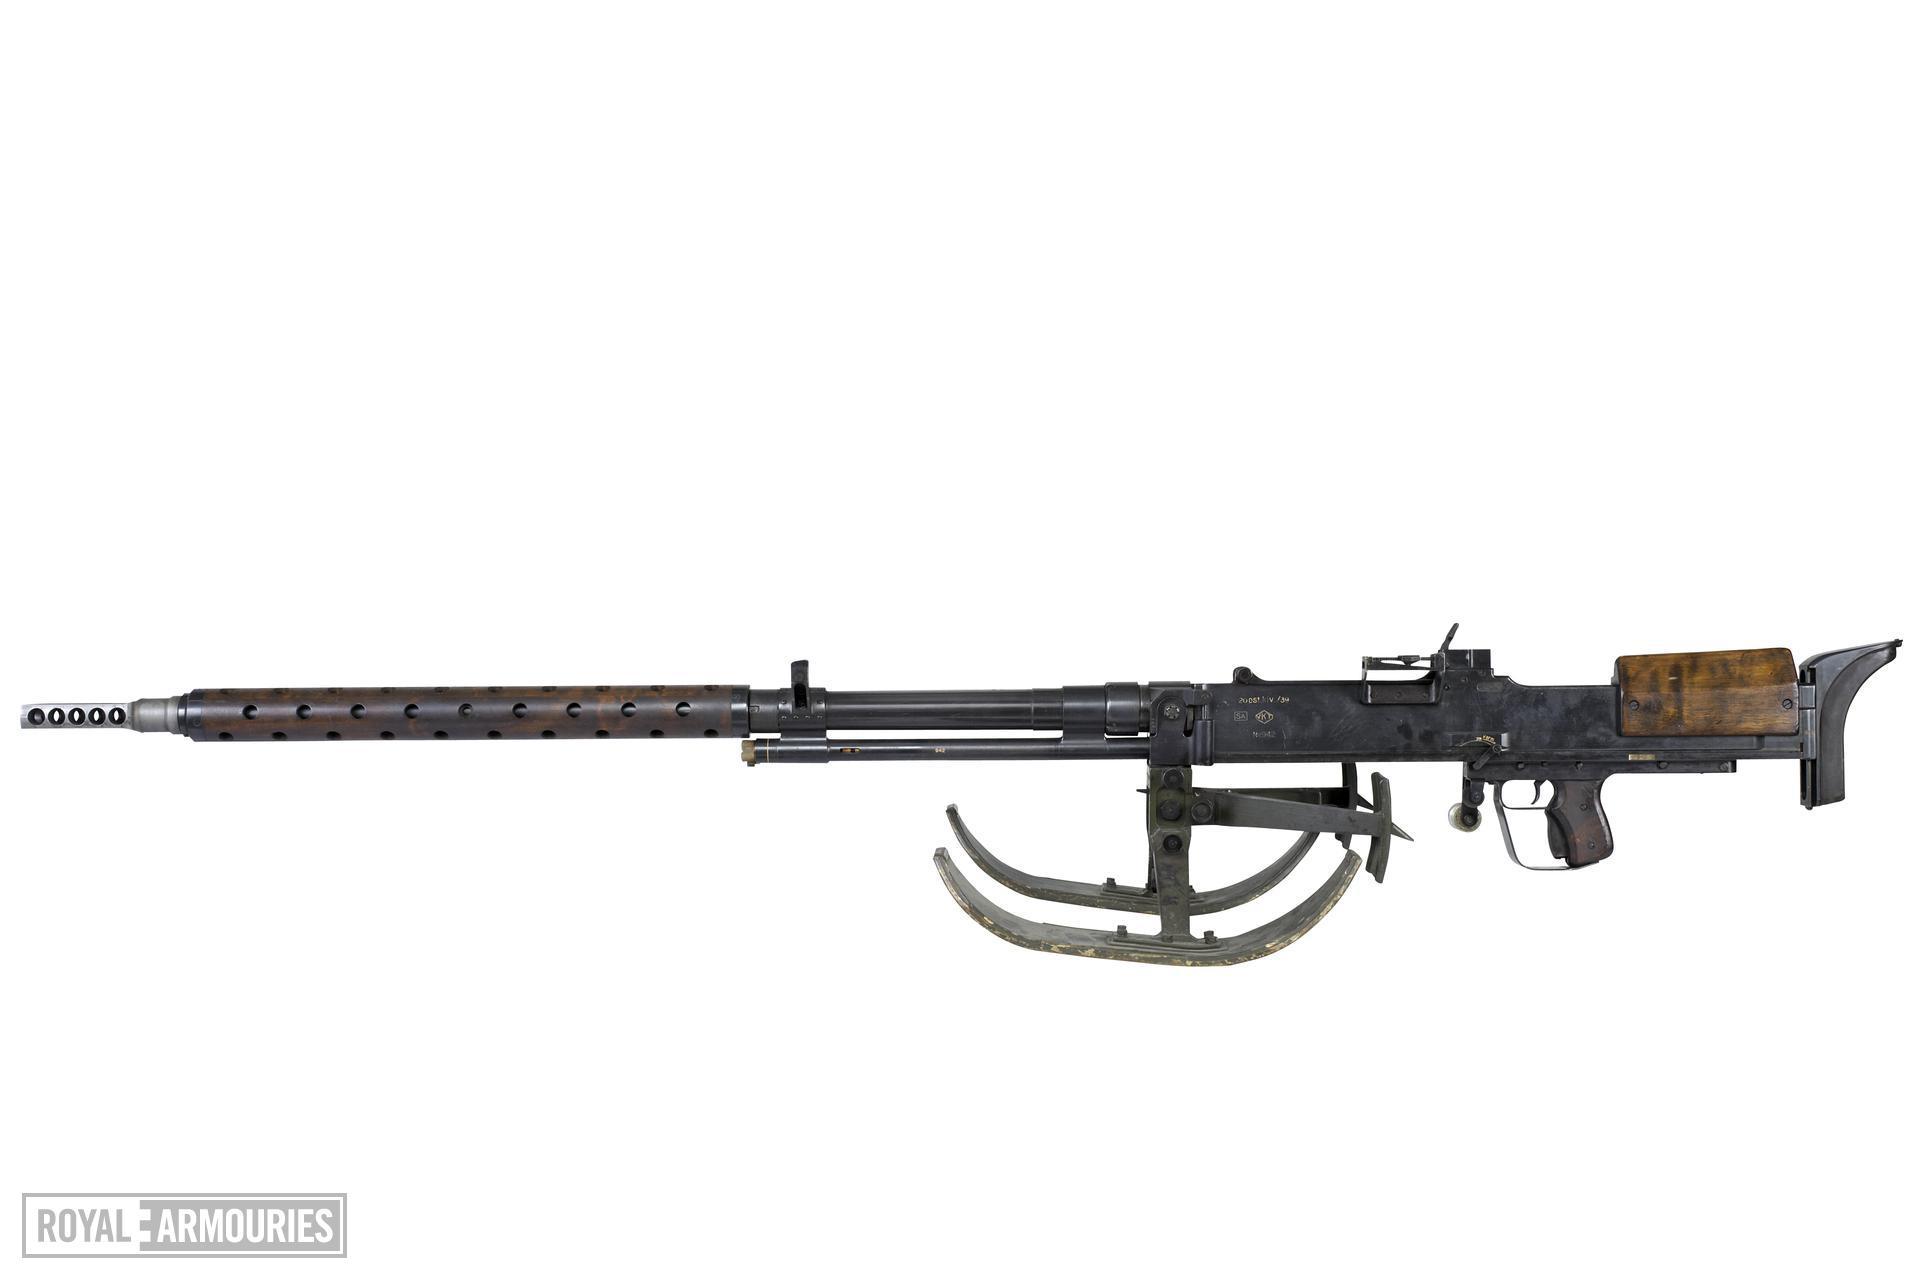 Centrefire self-loading rifle - Lahti M-39 For anti tank use